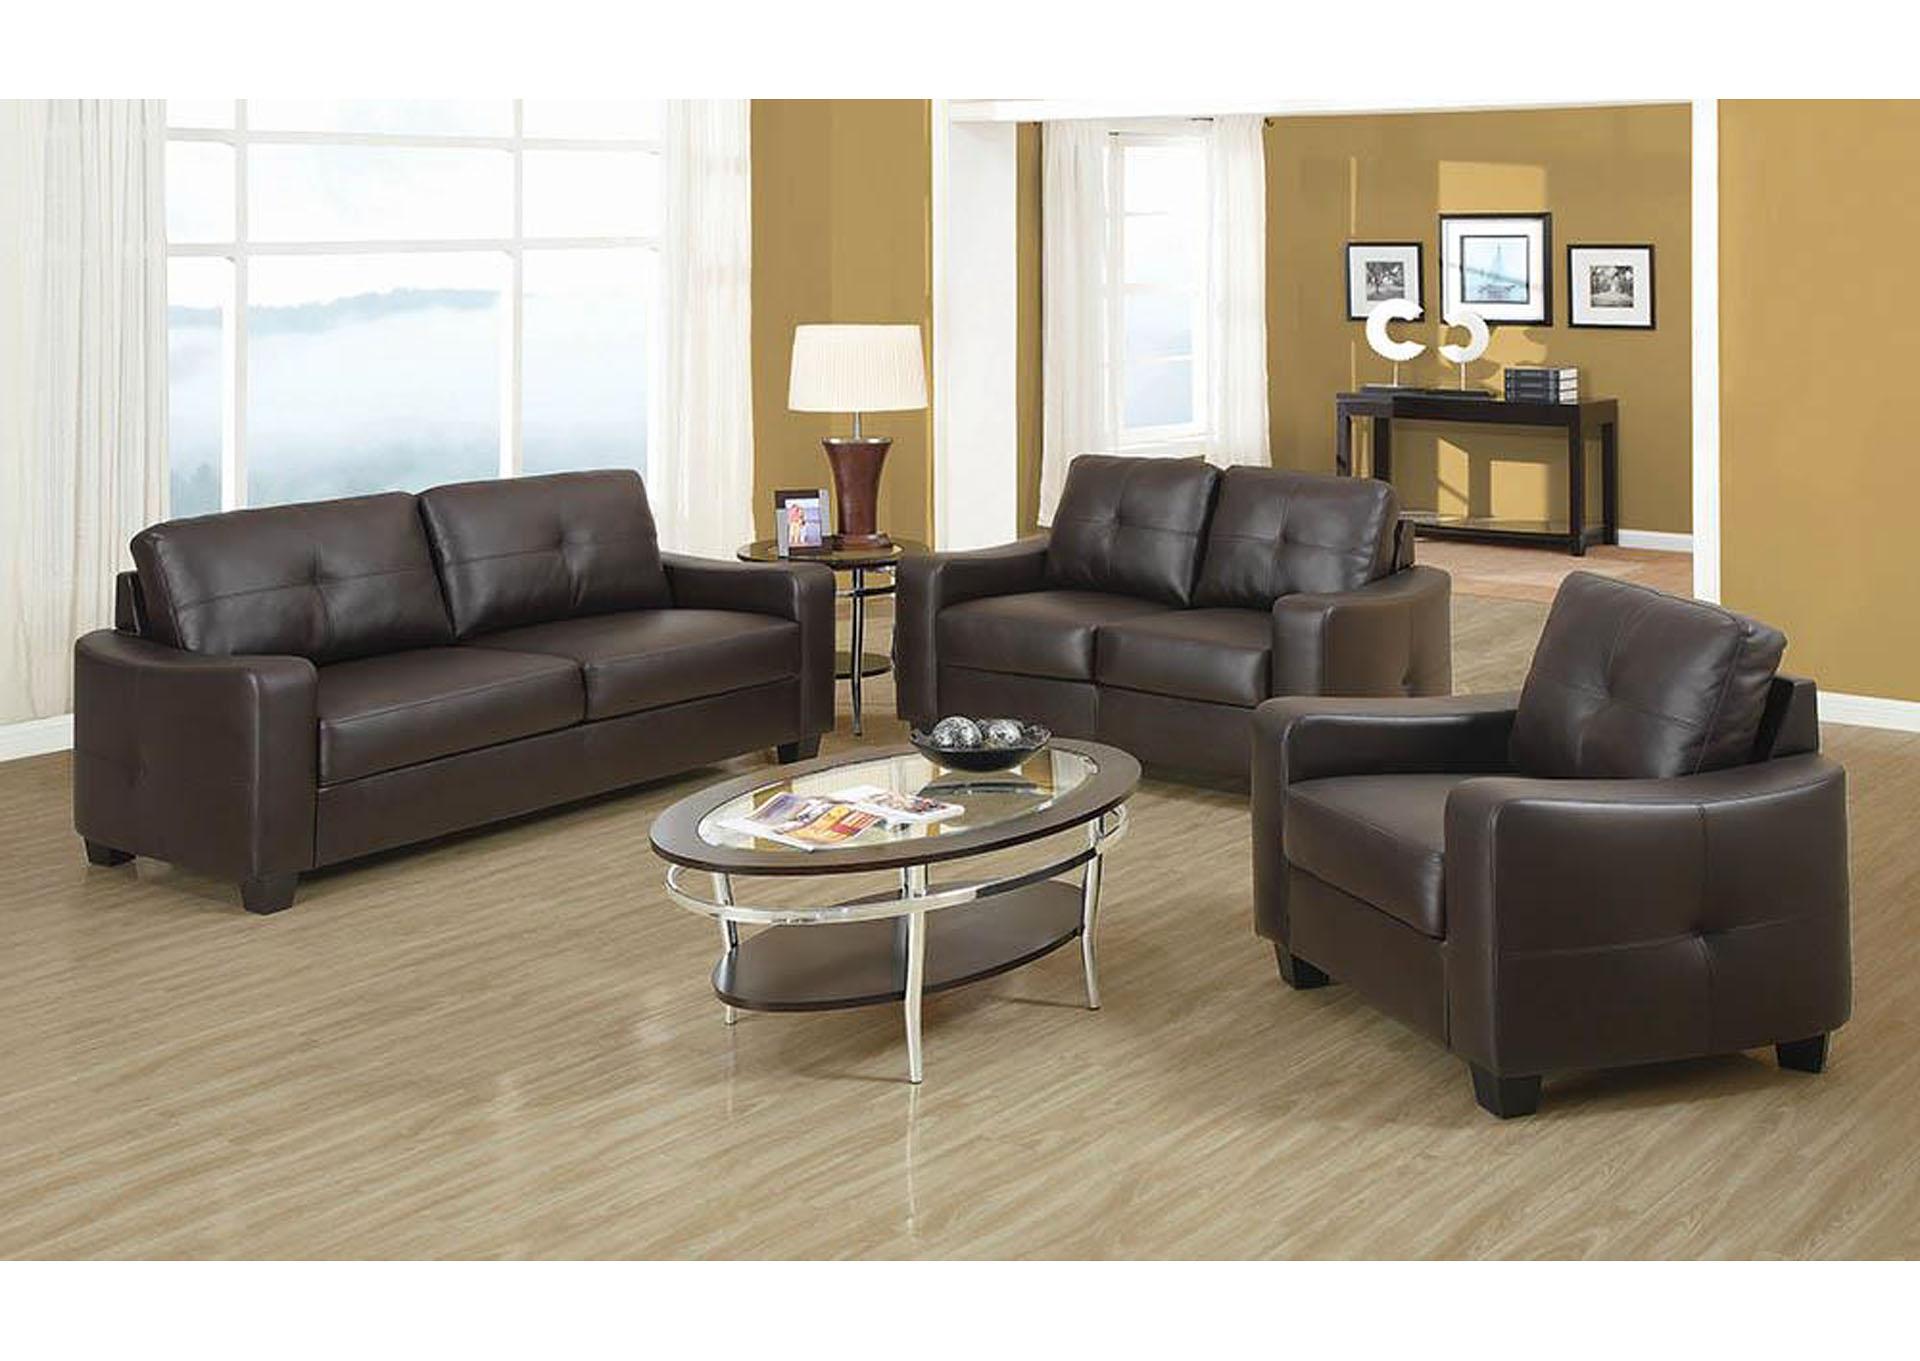 Furniture Liquidators Baton Rouge La Jasmine Brown Bonded Leather Love Seat